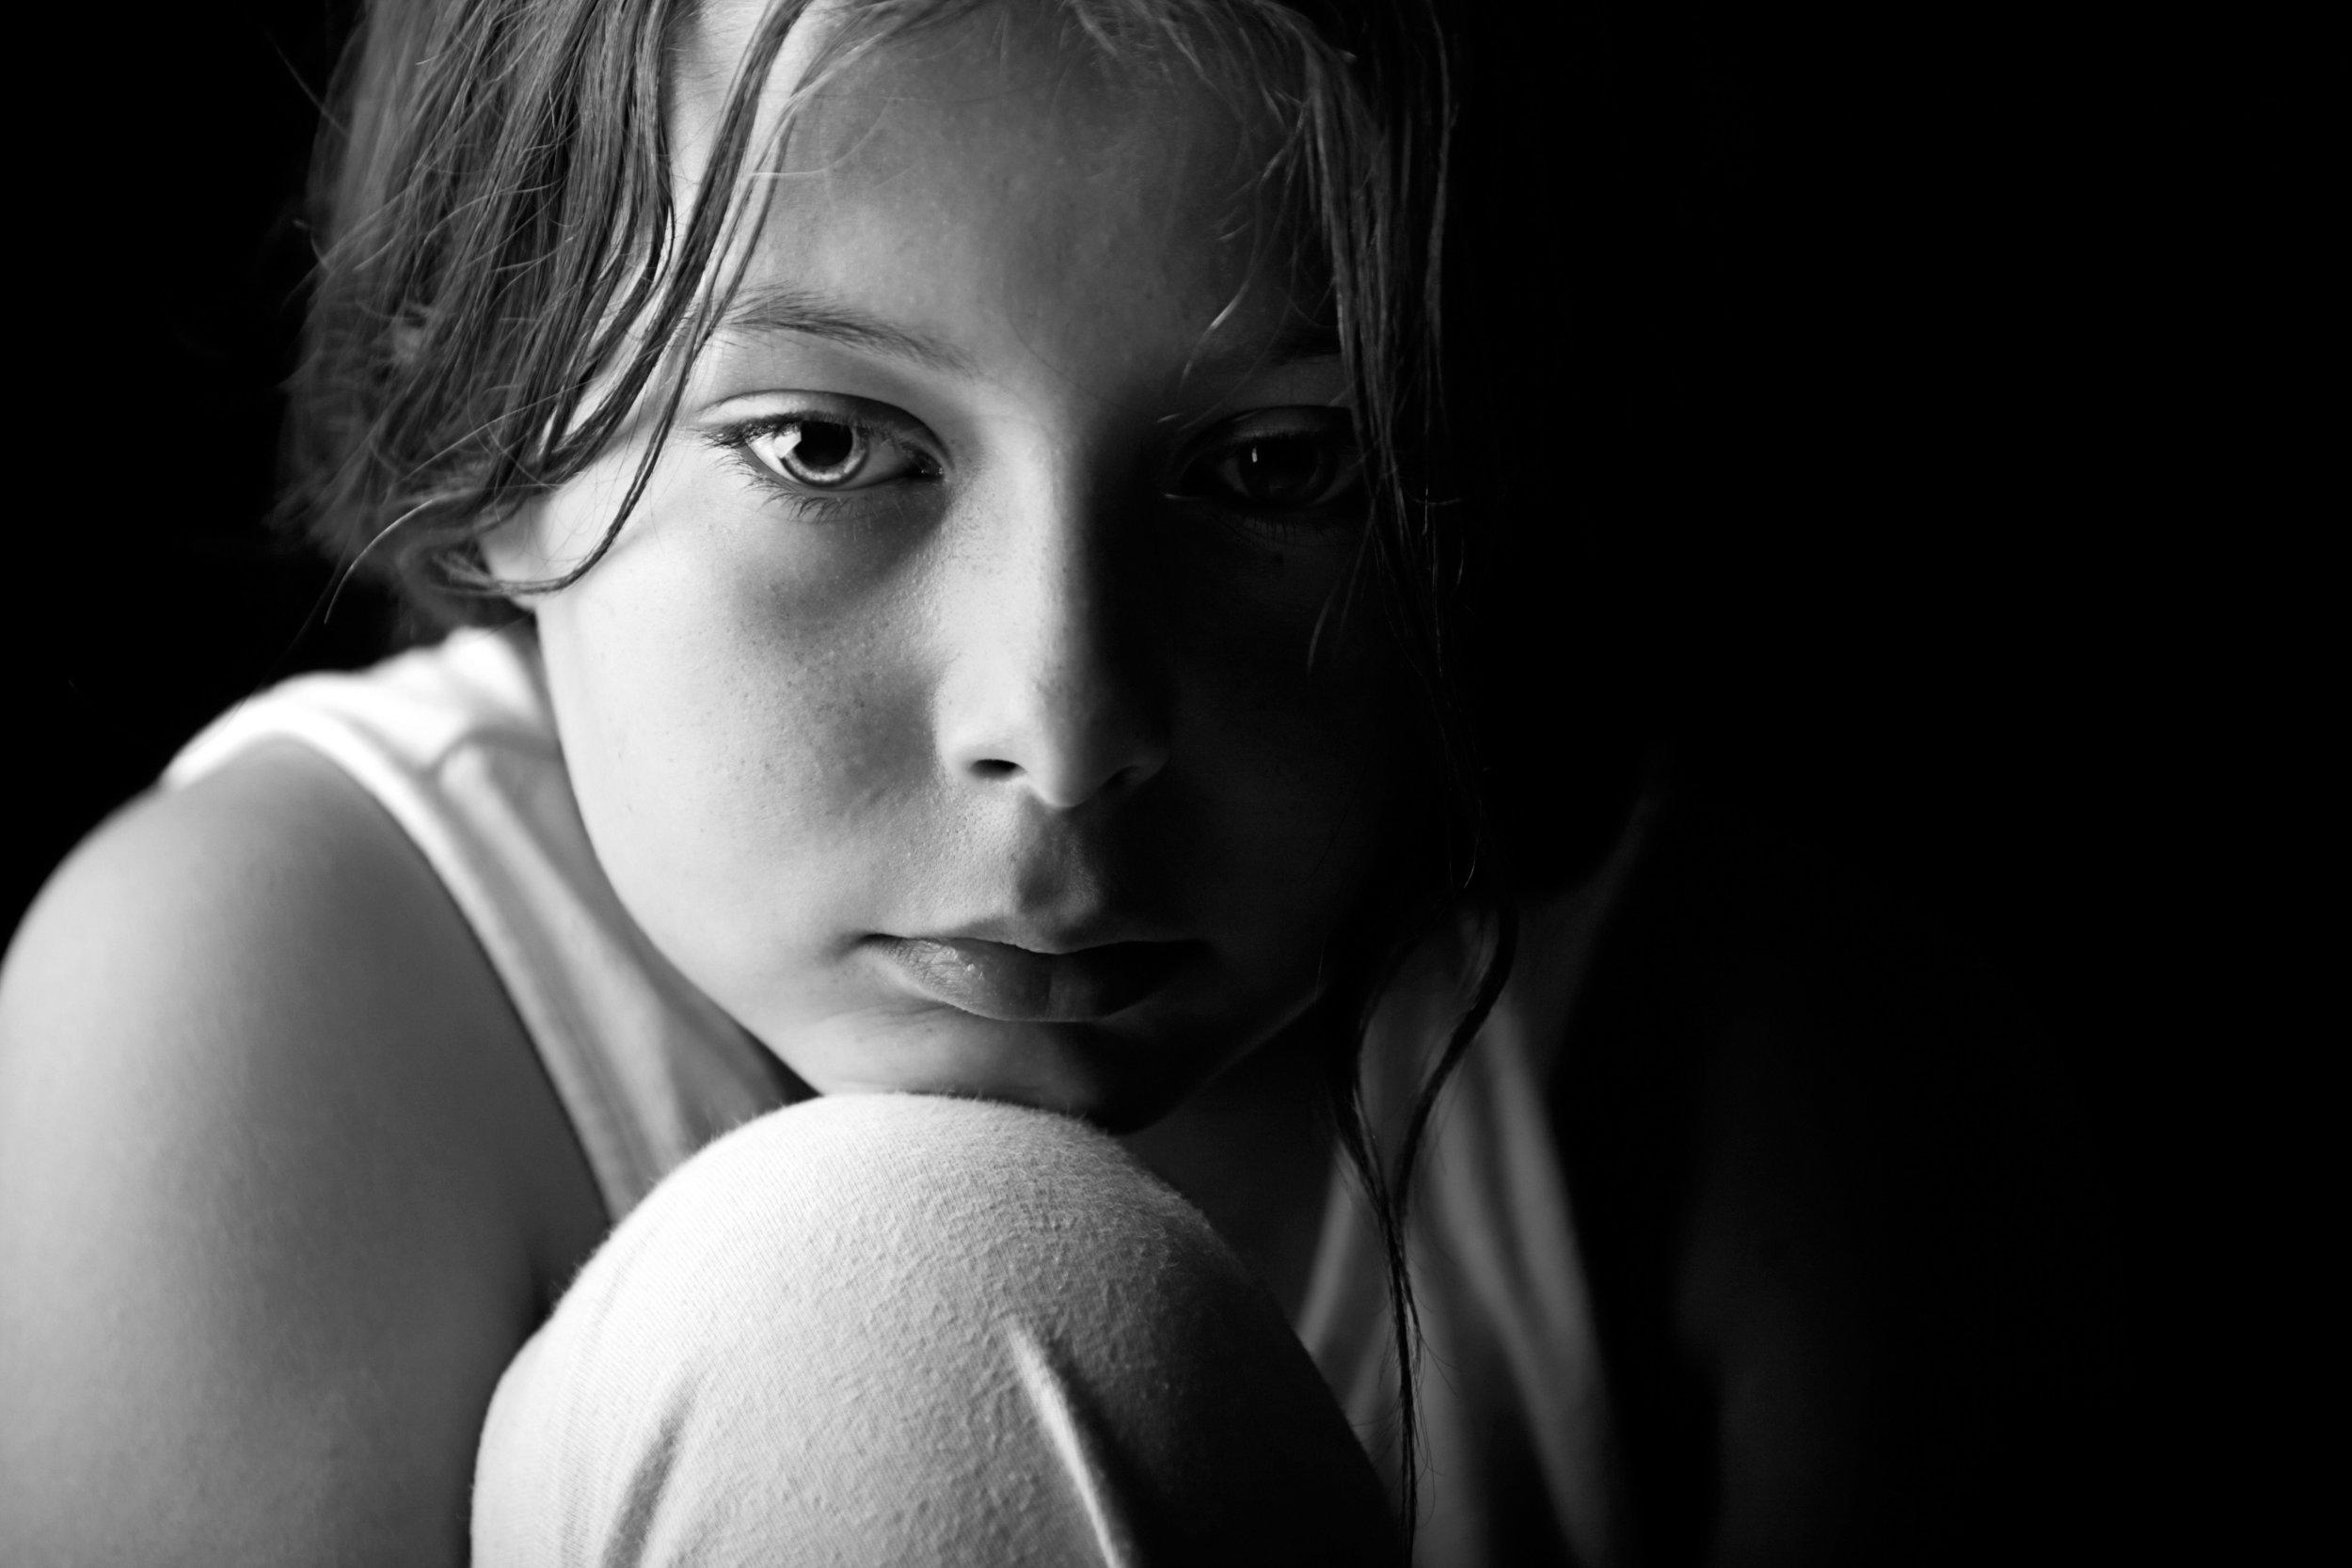 poverty-girl.jpg